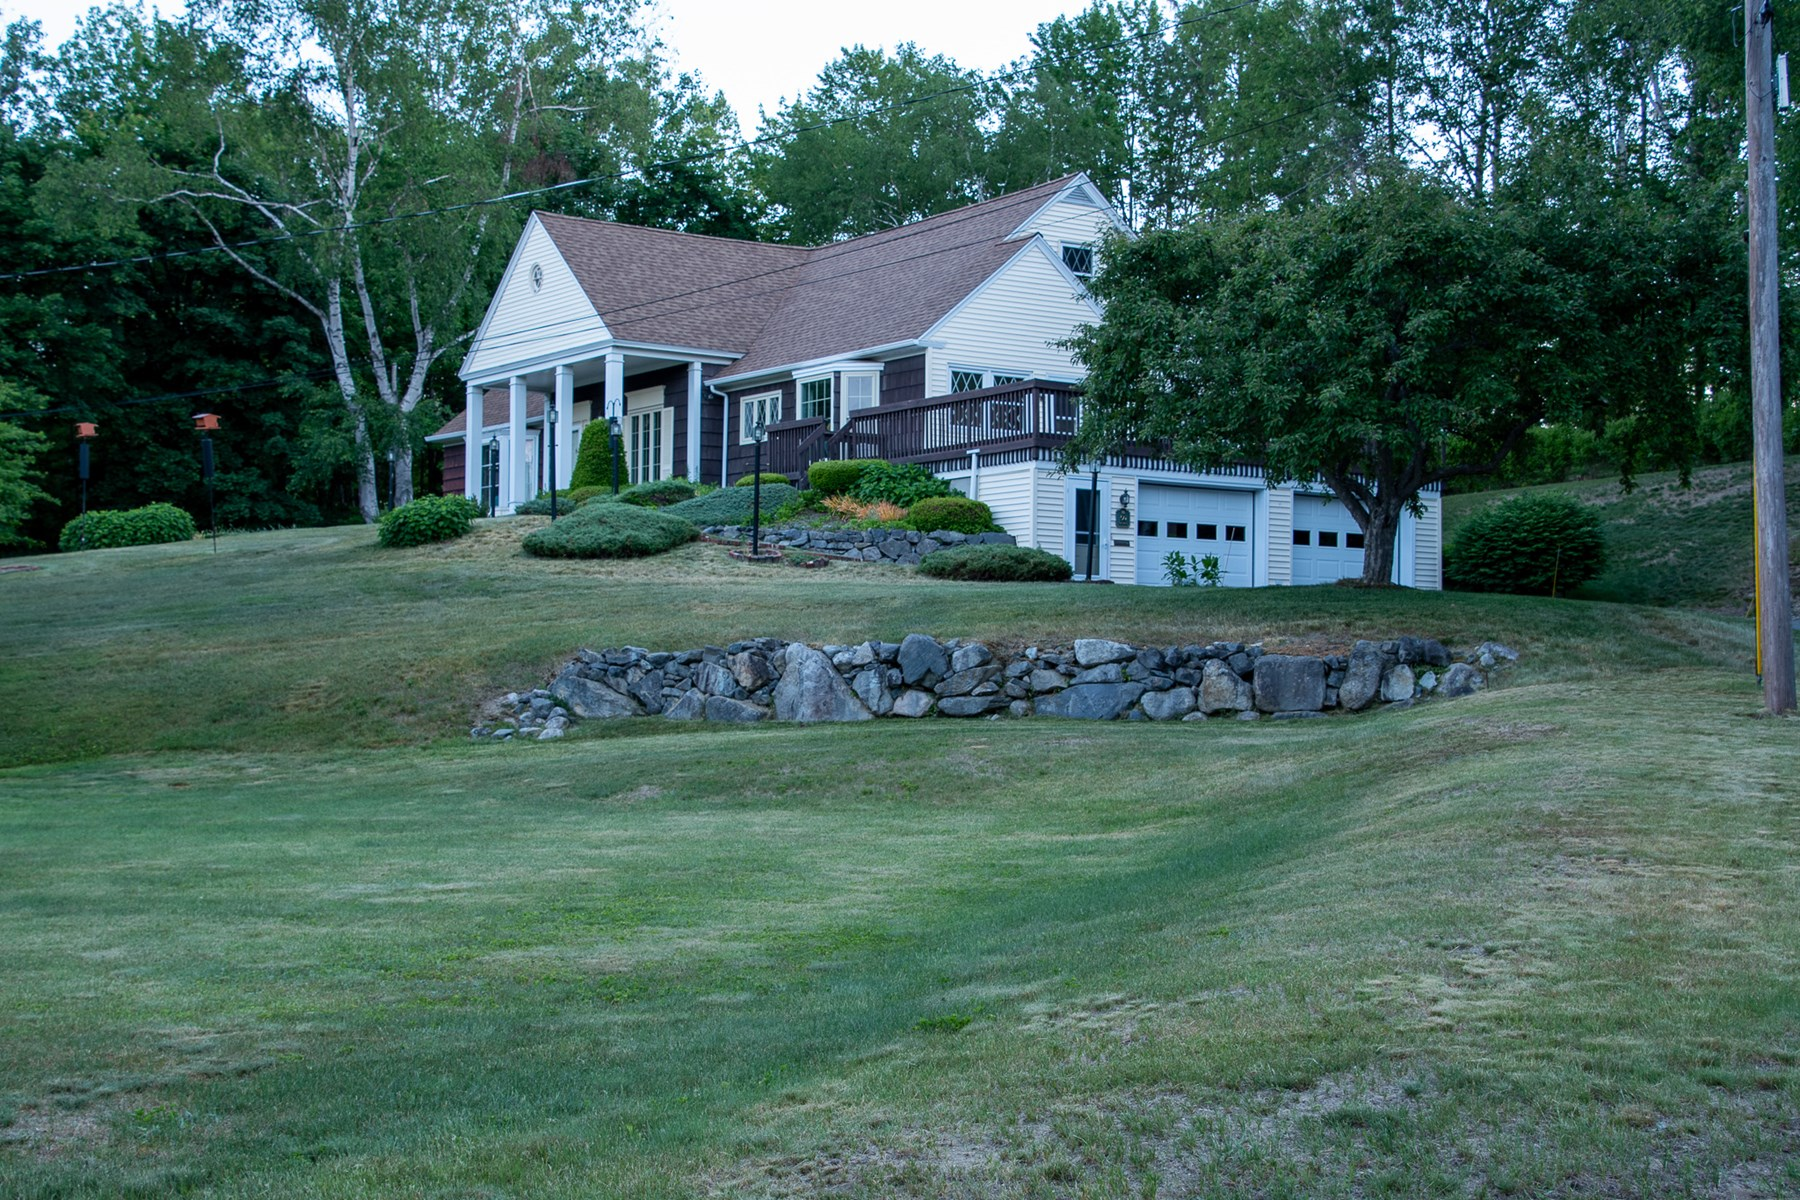 Contemporary Cape home in Millinocket, Maine